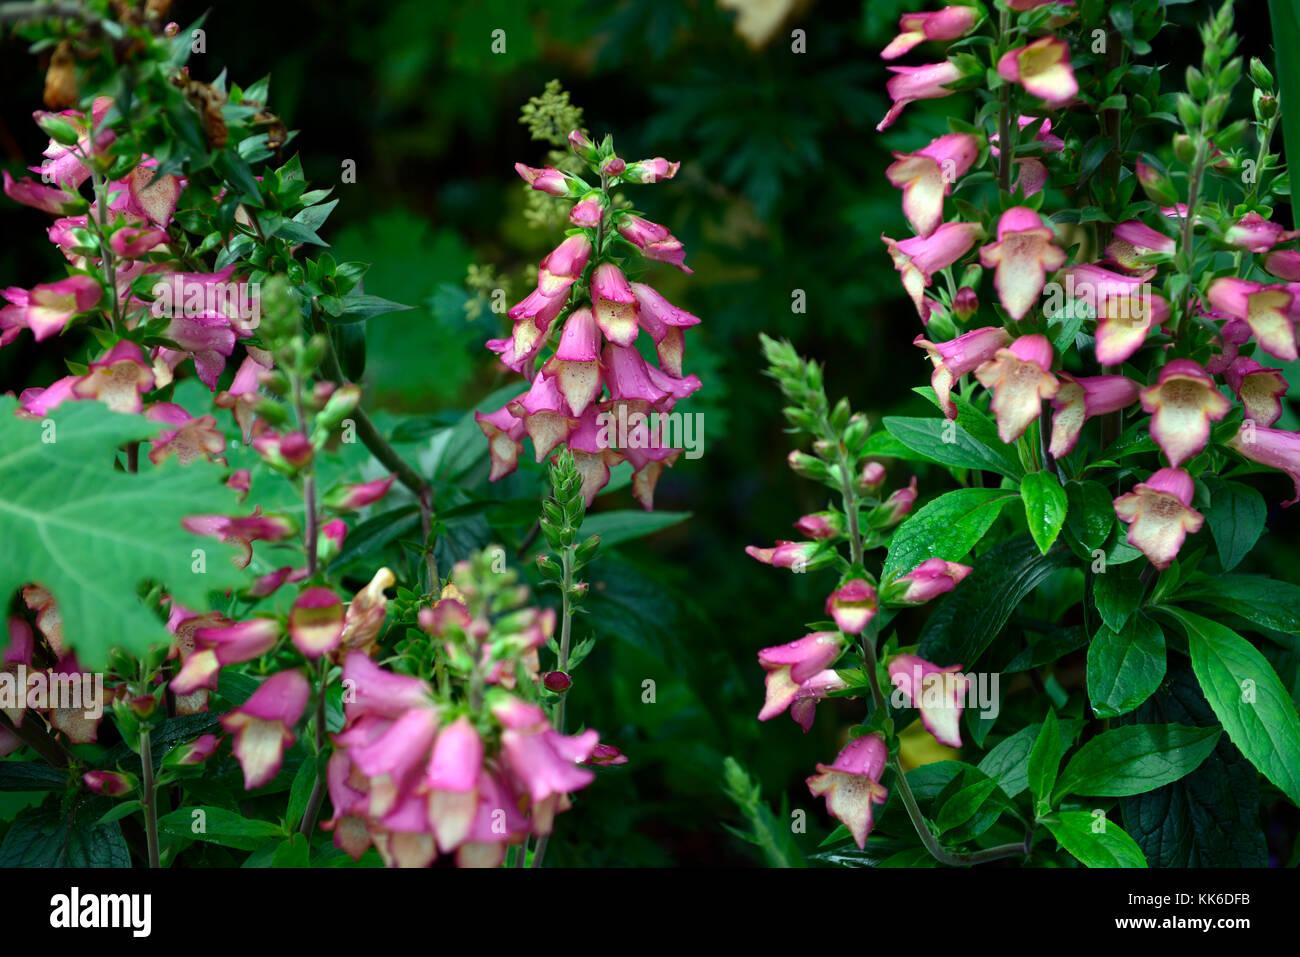 Digitalis Beleuchtung pink, Fingerhut, Fingerhut, steril, Hybrid, Isoplexis, mehrjährige Pflanze, Blume, Blumen, Stockbild